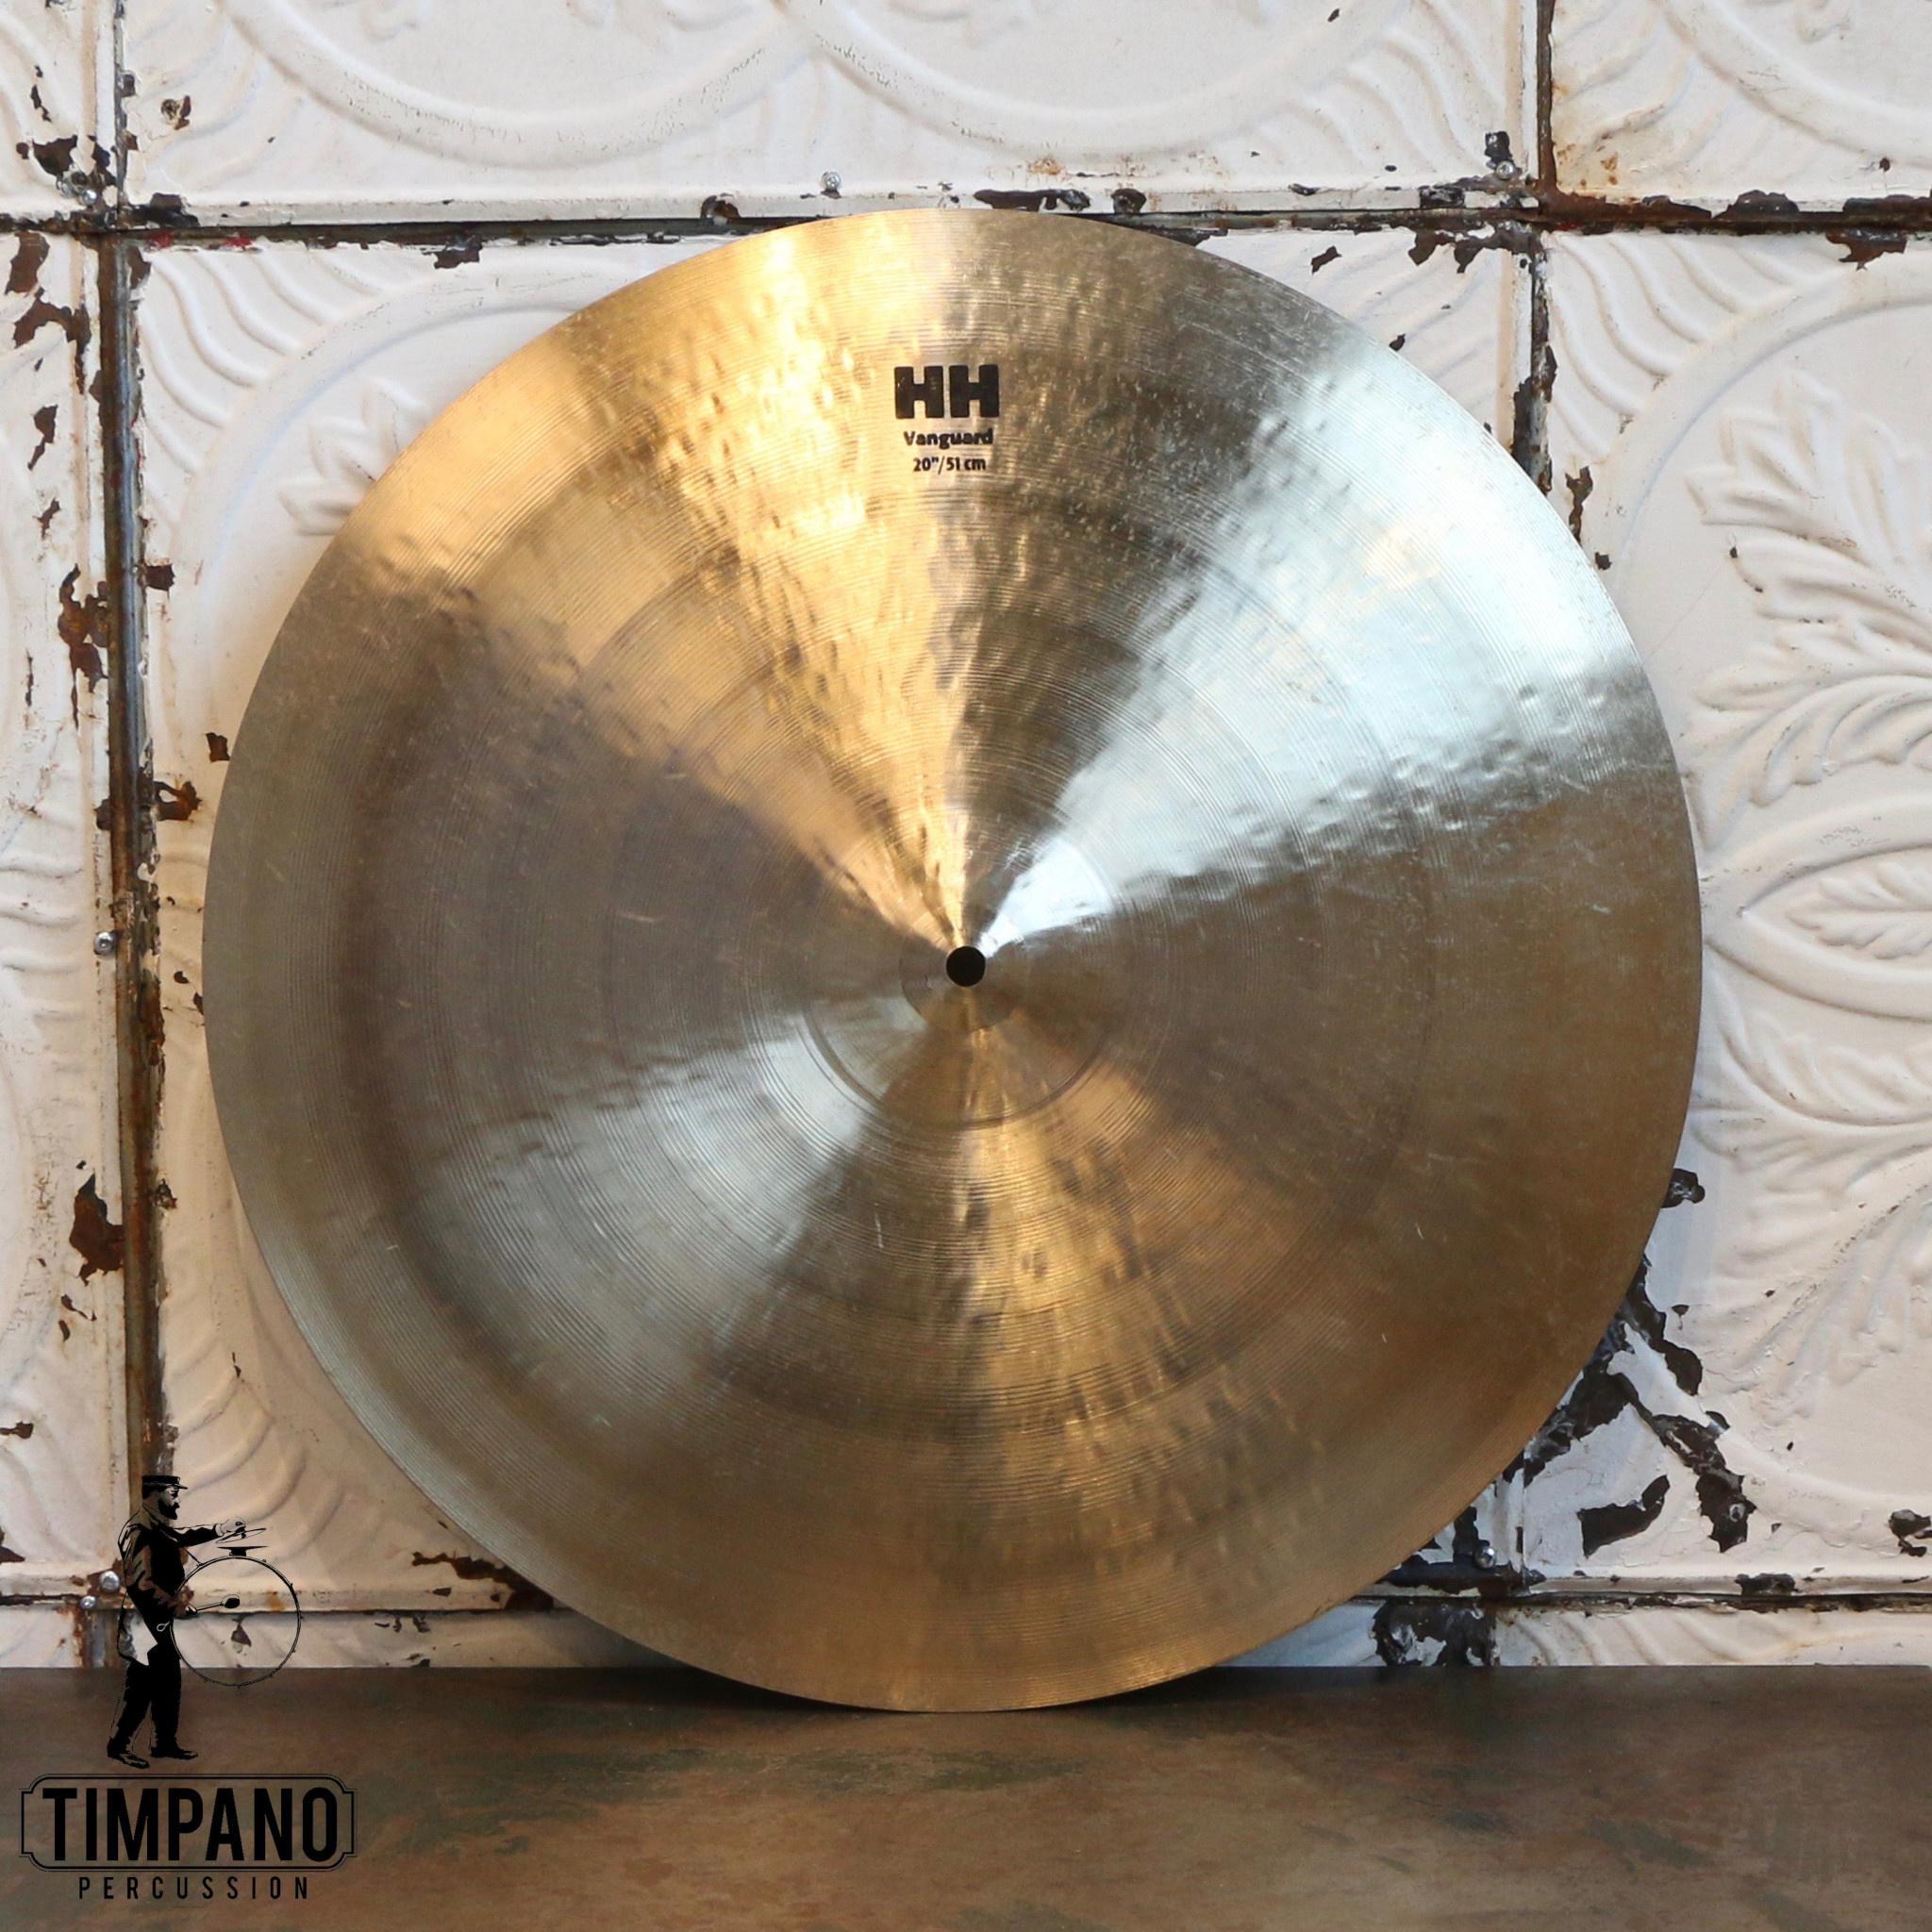 Sabian Cymbale usagée Sabian HH Vanguard 20po